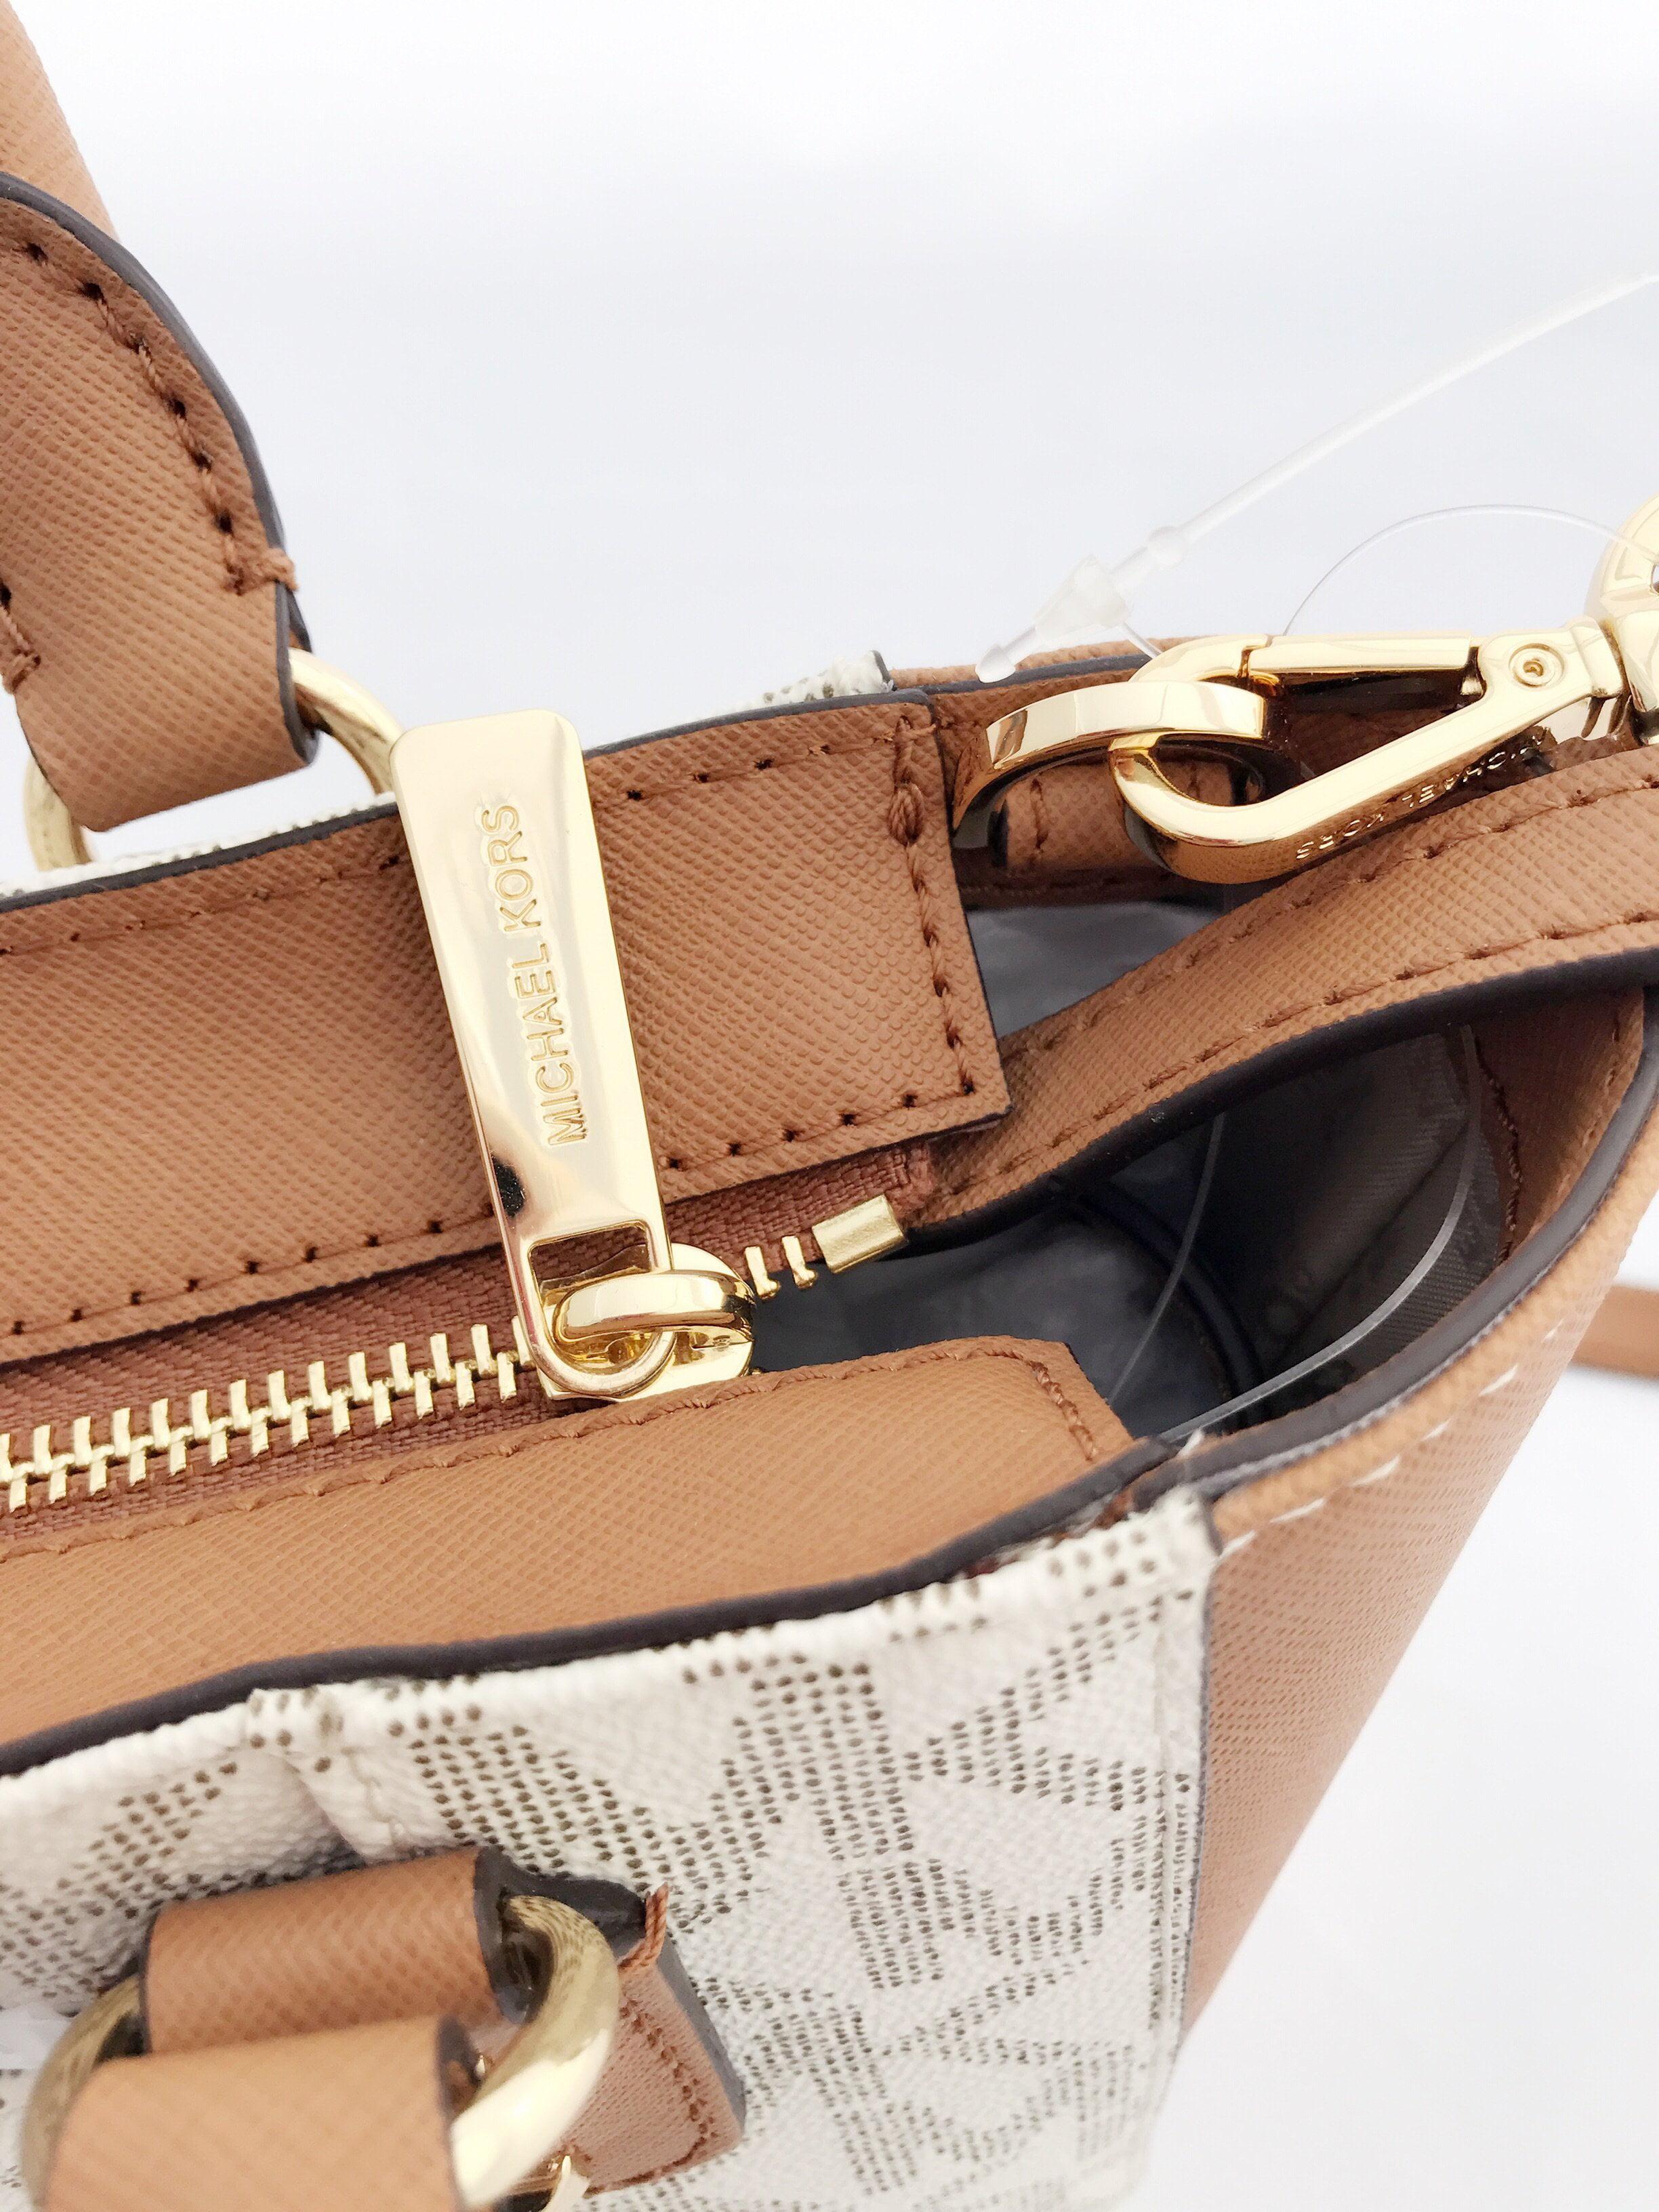 629b6b552354bb Michael Kors - Michael Kors Sandrine Pyramid Stud Mini Tote Crossbody Bag  Vanilla MK Signature - Walmart.com